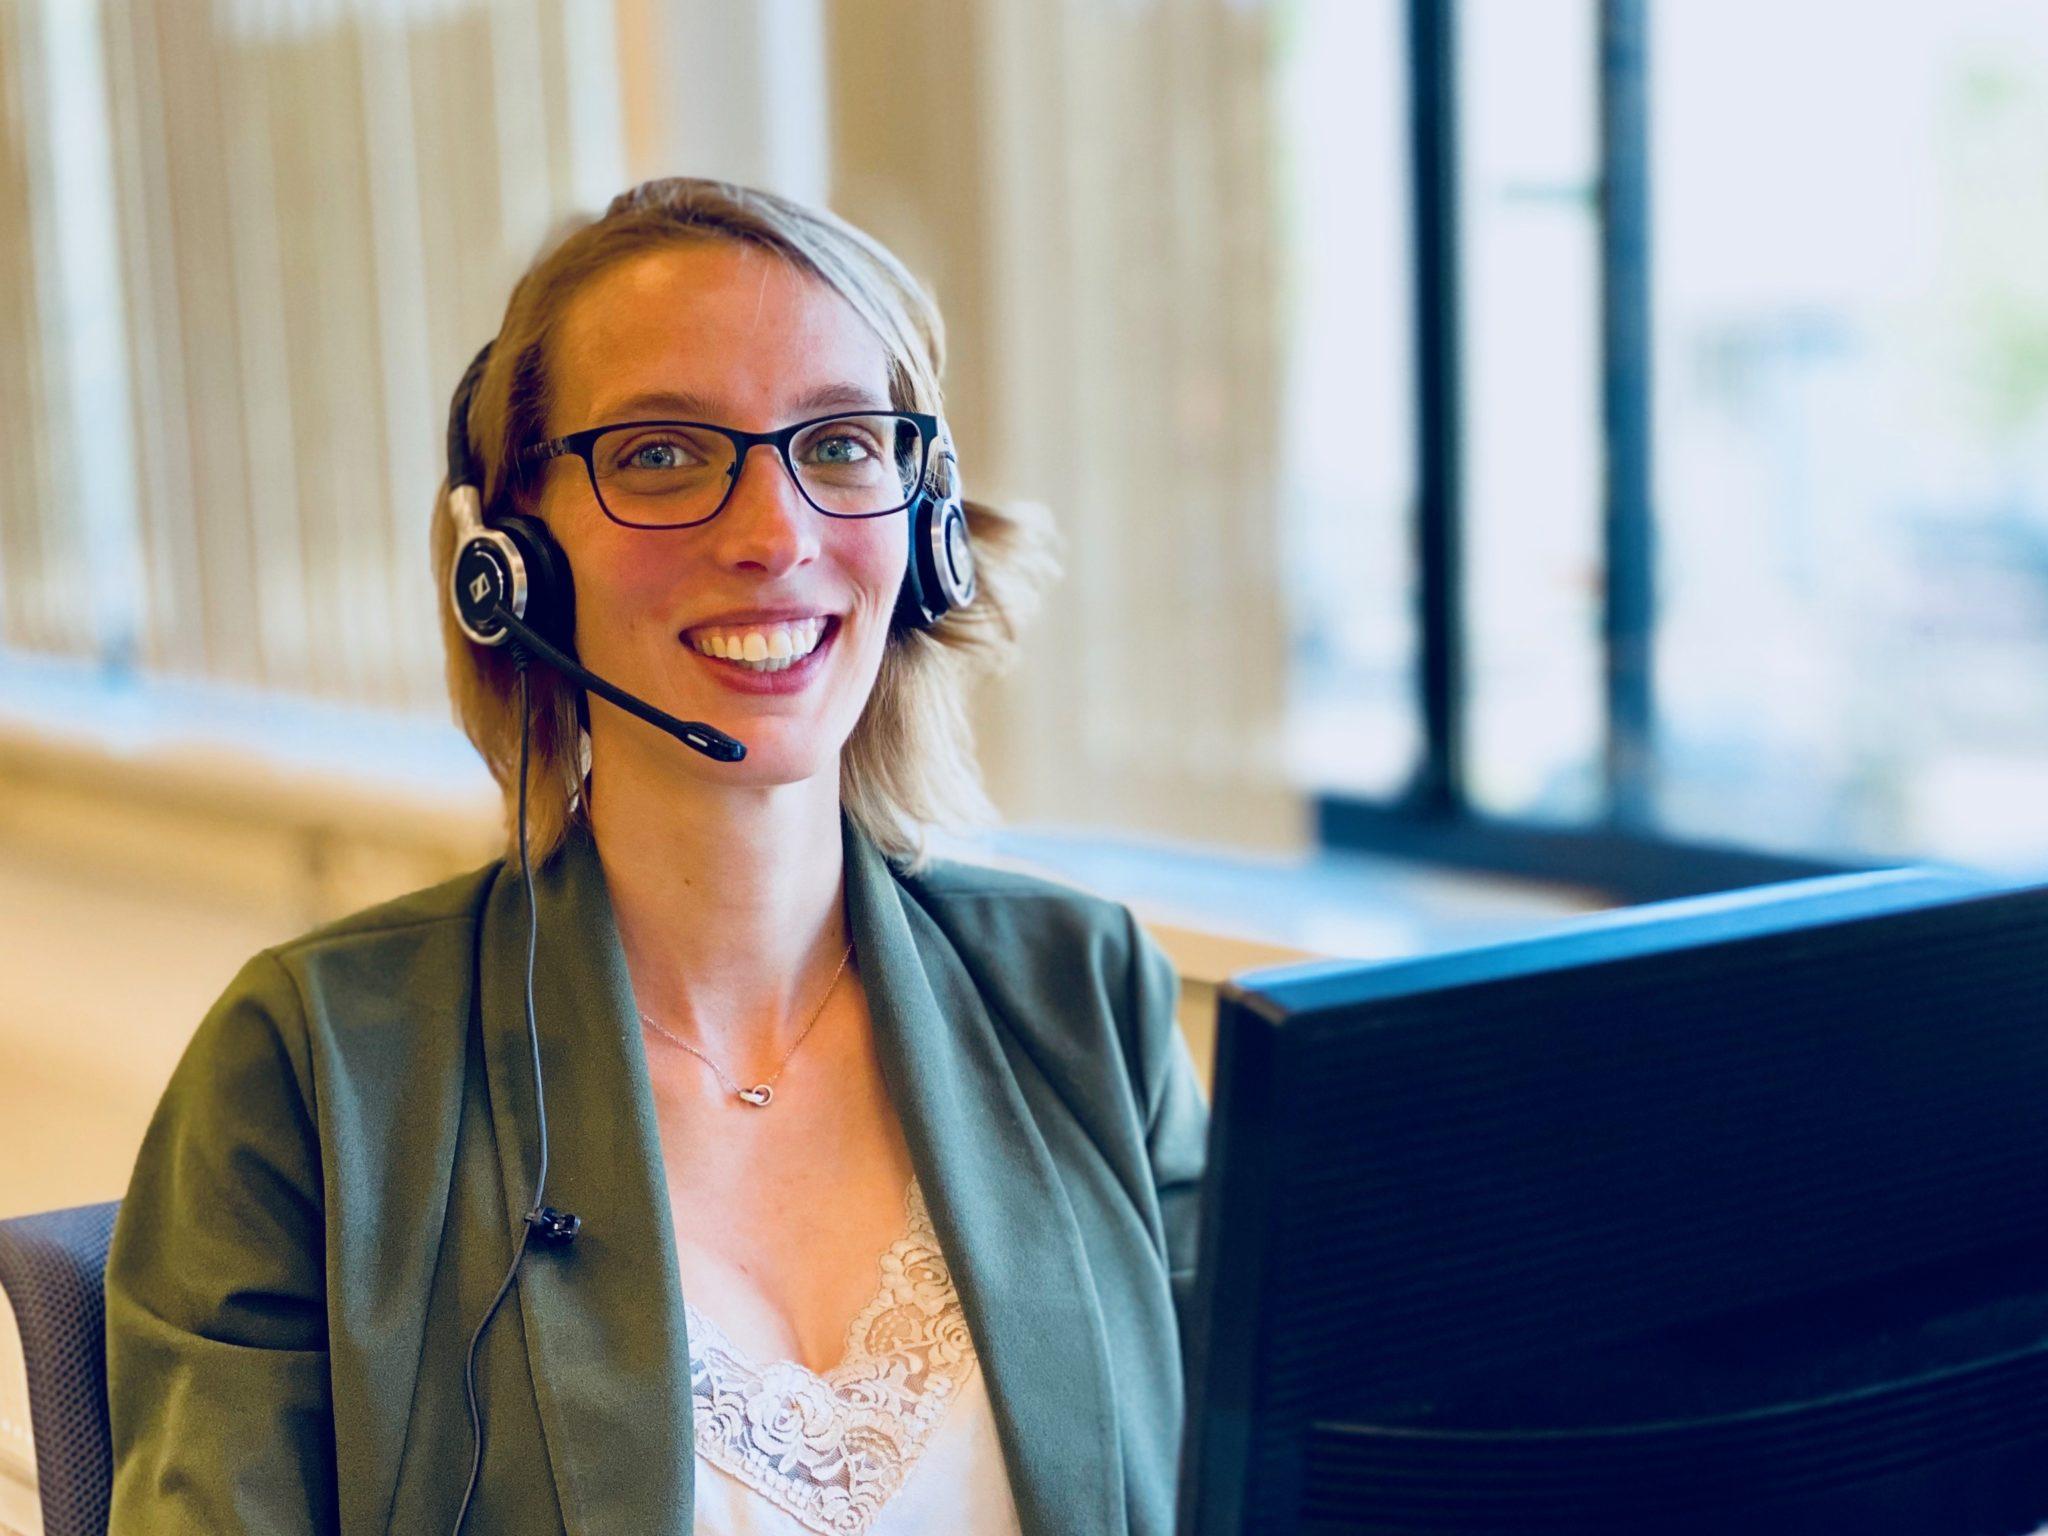 Accountmanager Blanche Nowak